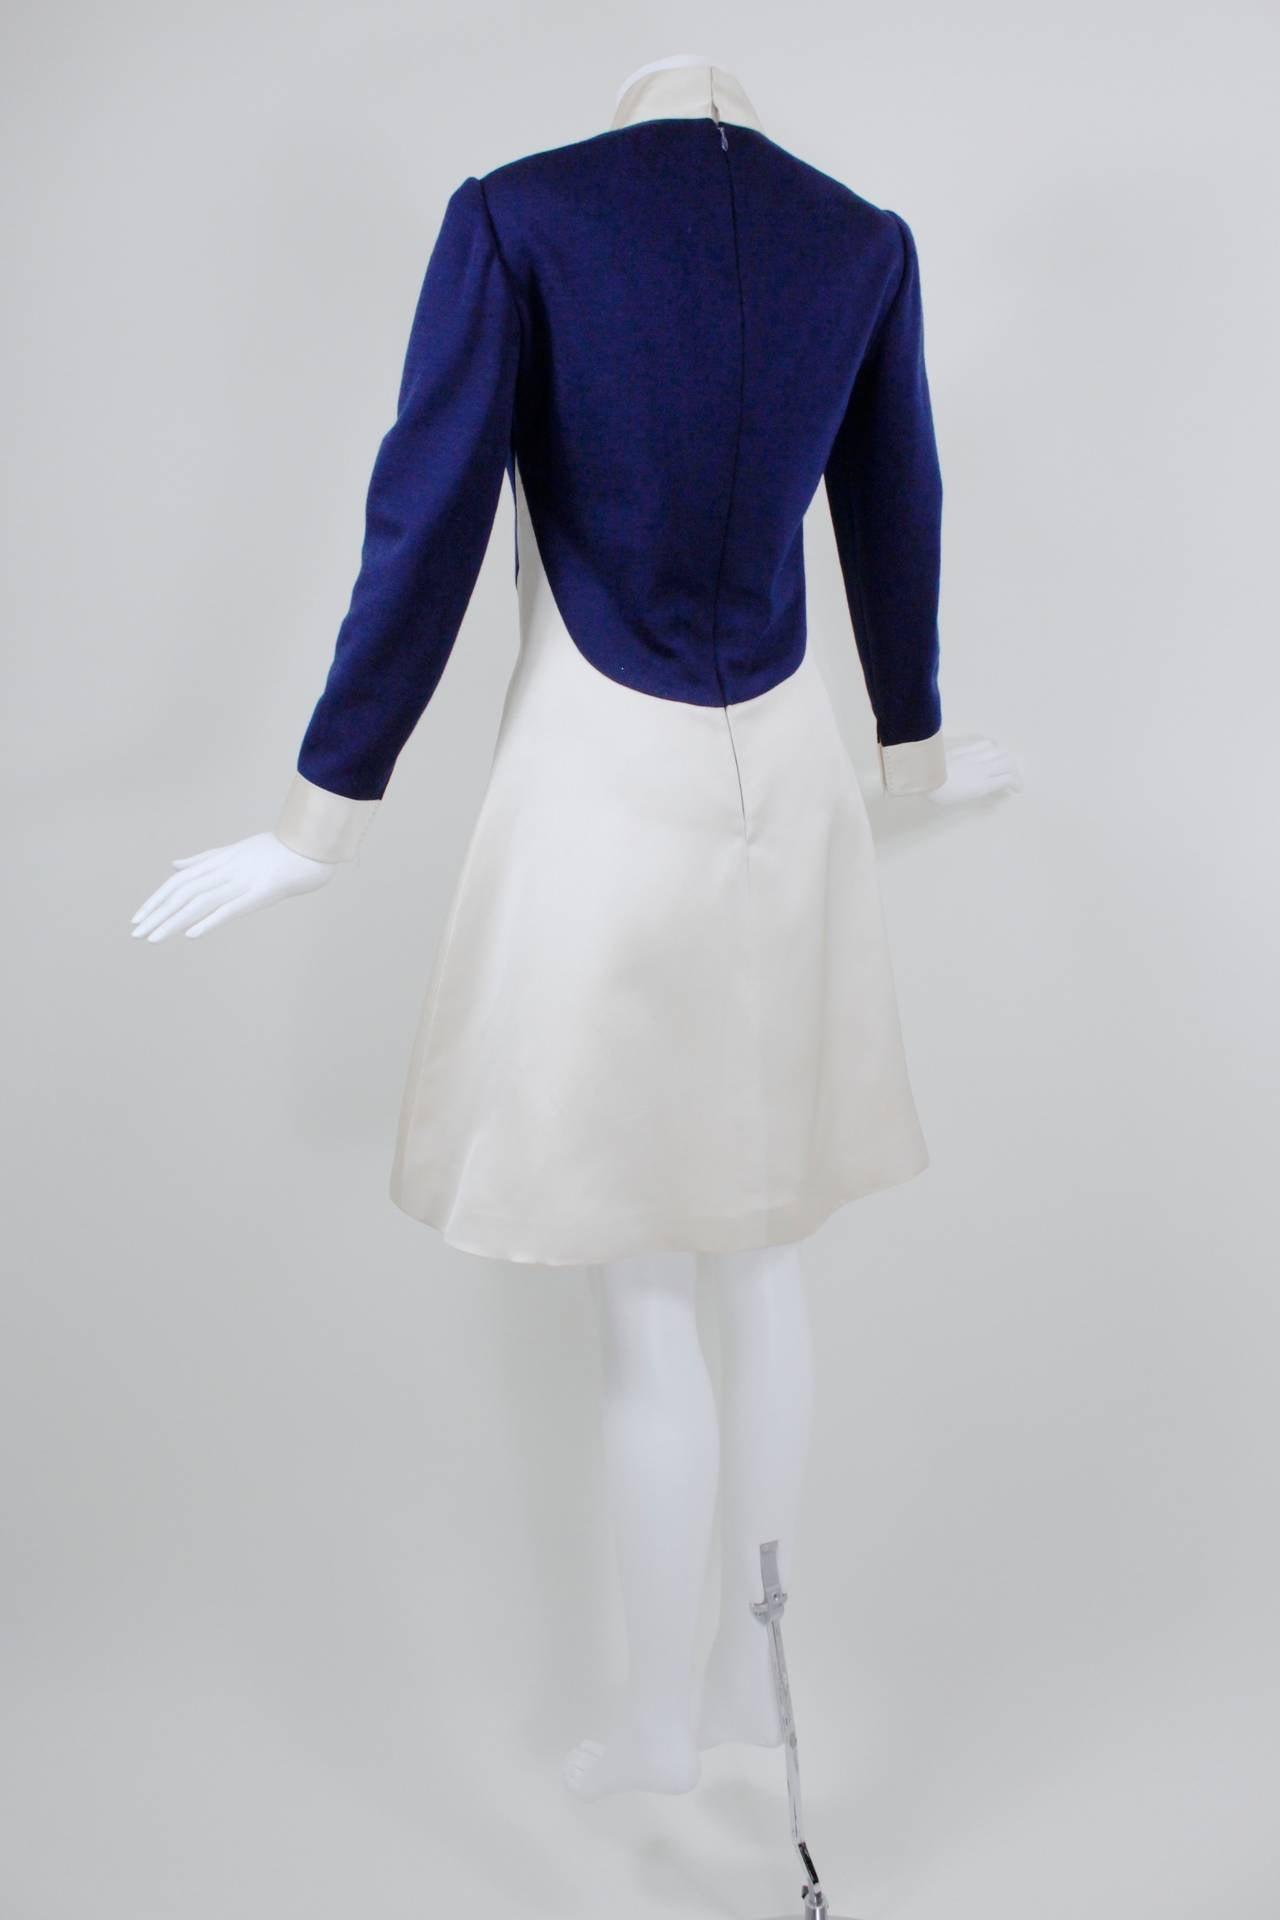 1960s Geoffrey Beene Navy Wool and Eggshell Mod Dress 4